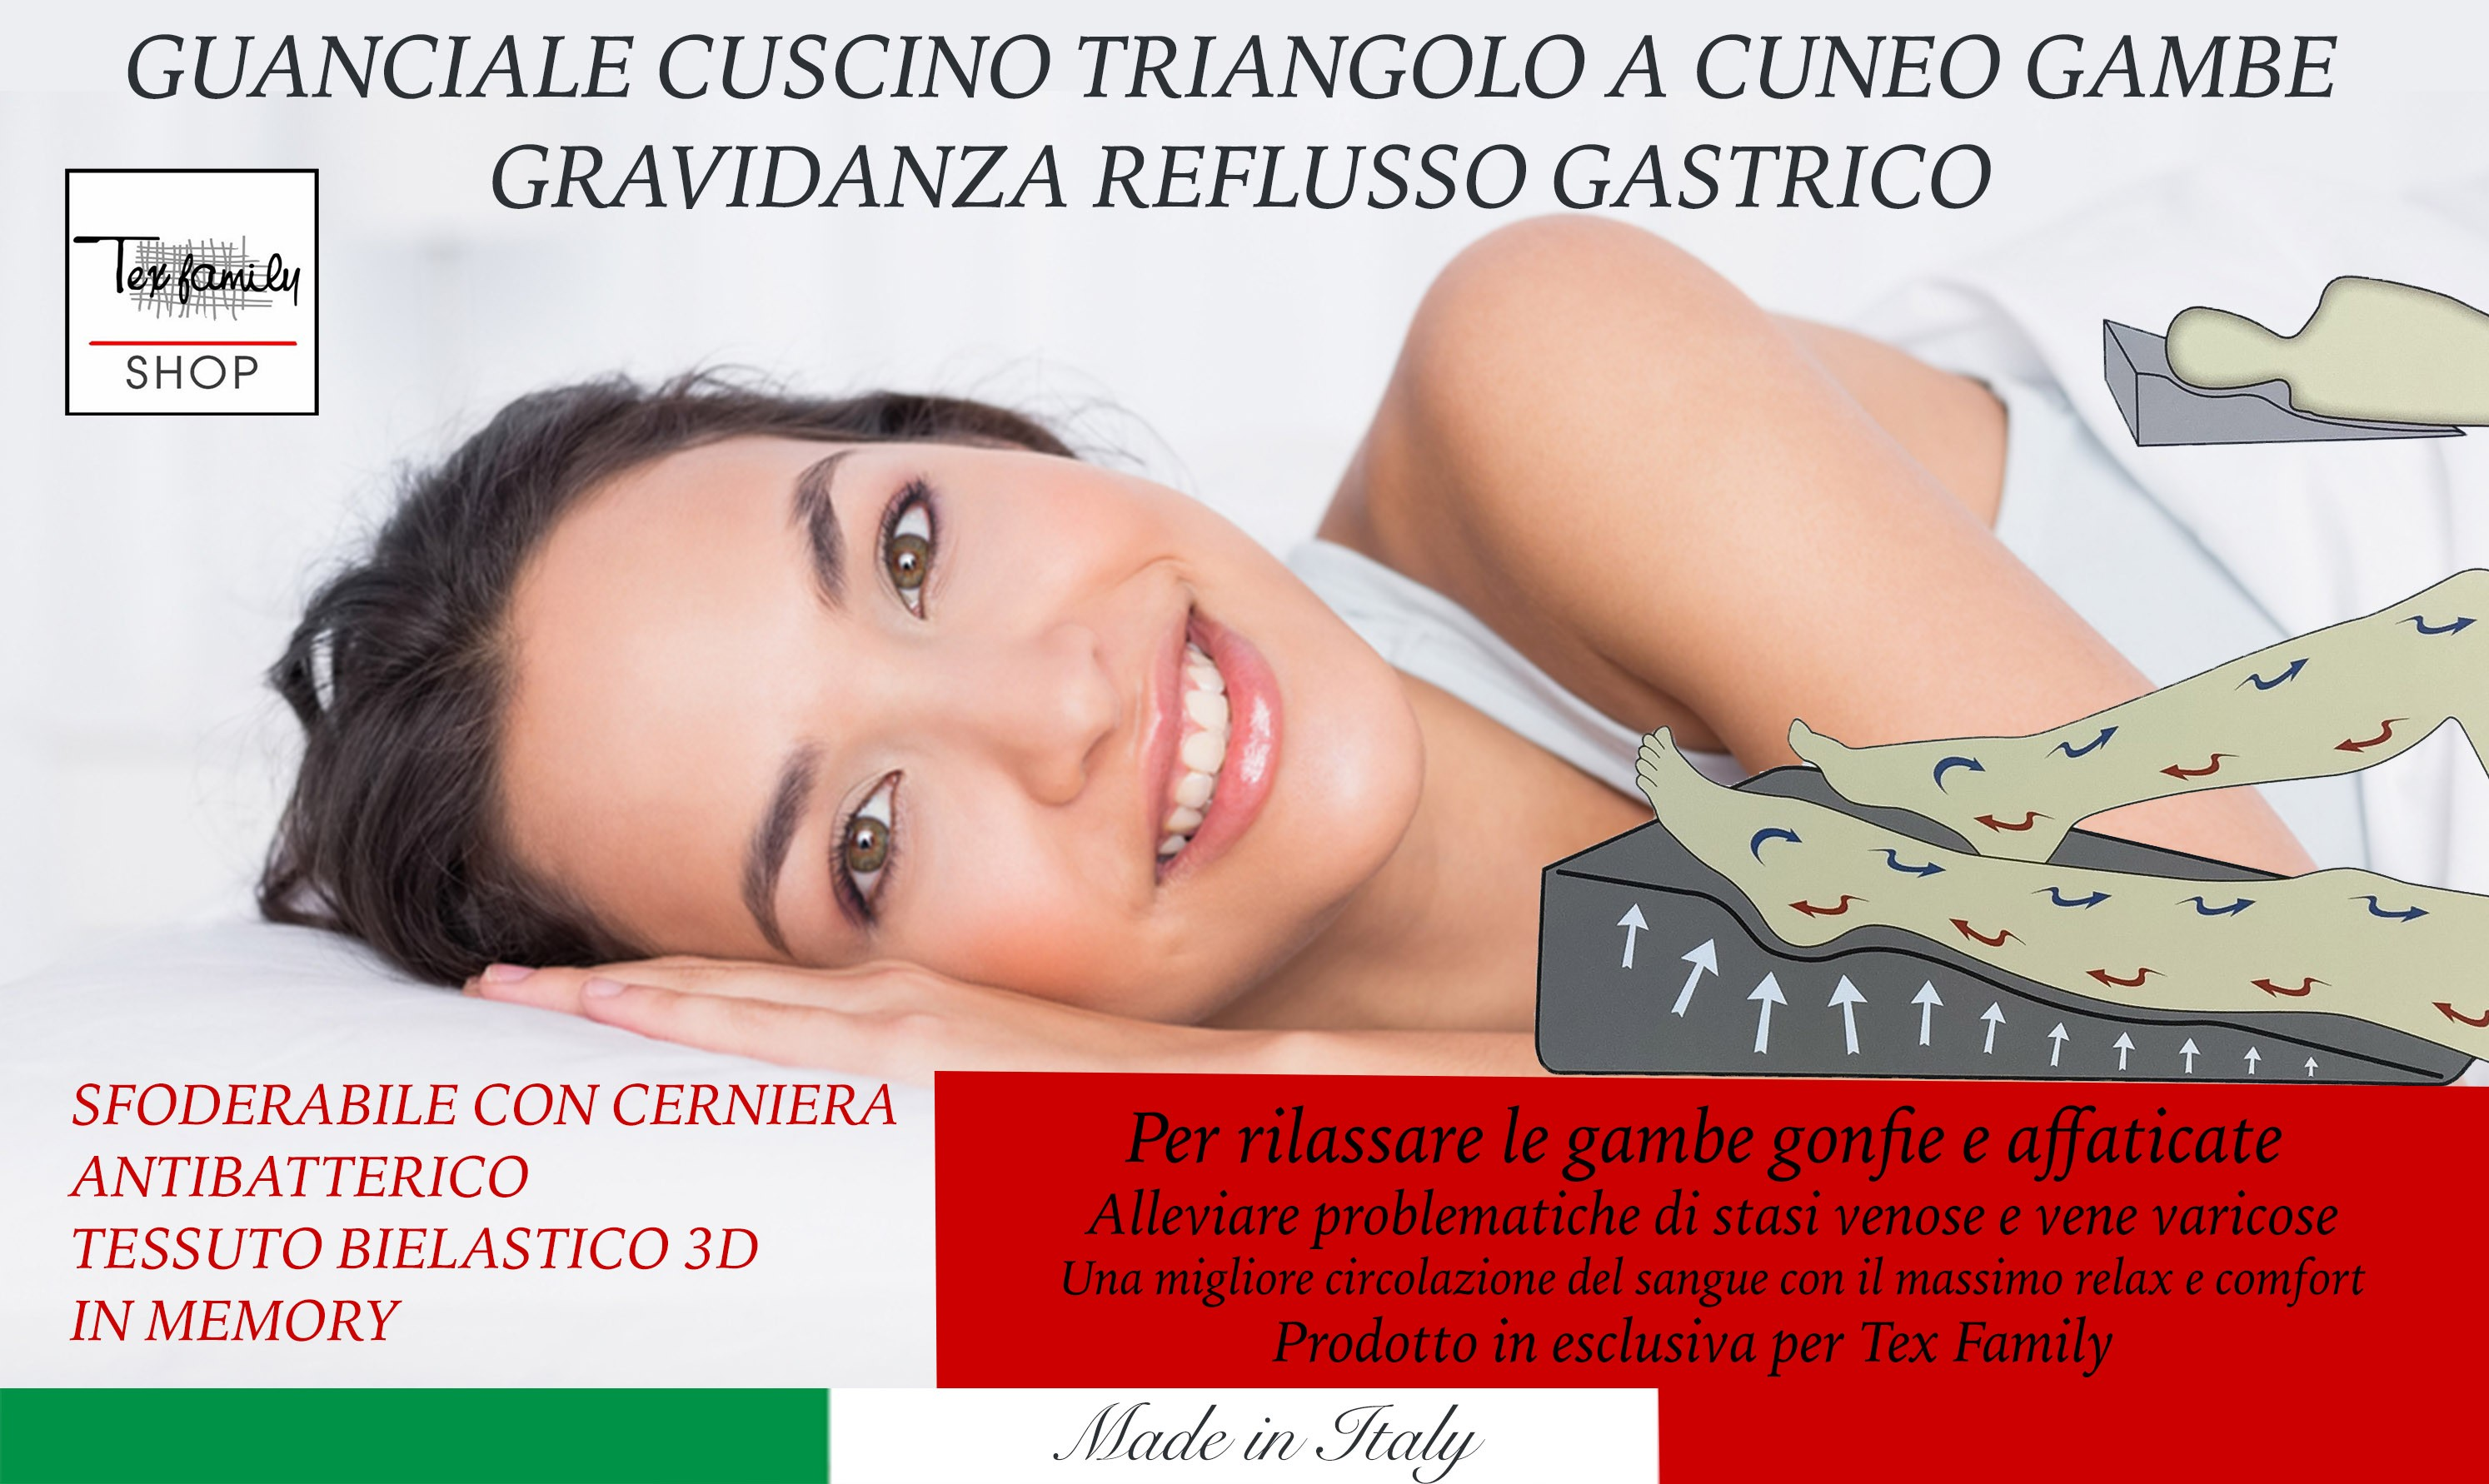 Cuscino Per Gambe Gonfie.Guanciale Cuscino Triangolo A Cuneo Gambe Gravidanza Reflusso Gastrico